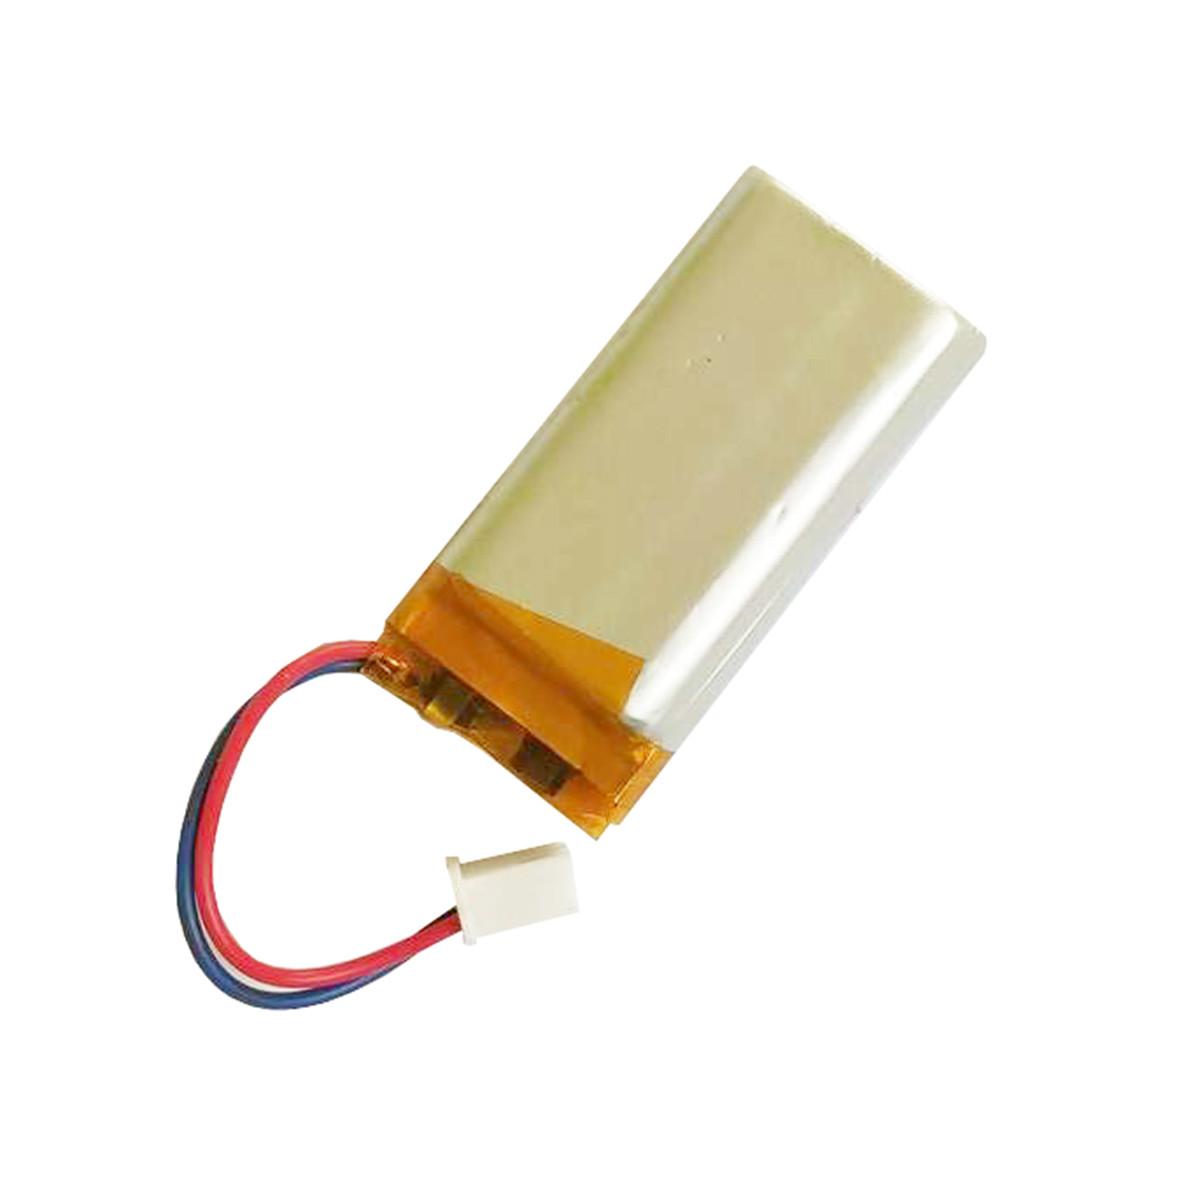 Аспіратор запчастини LITTLE BEES (LB-009) акумулятор